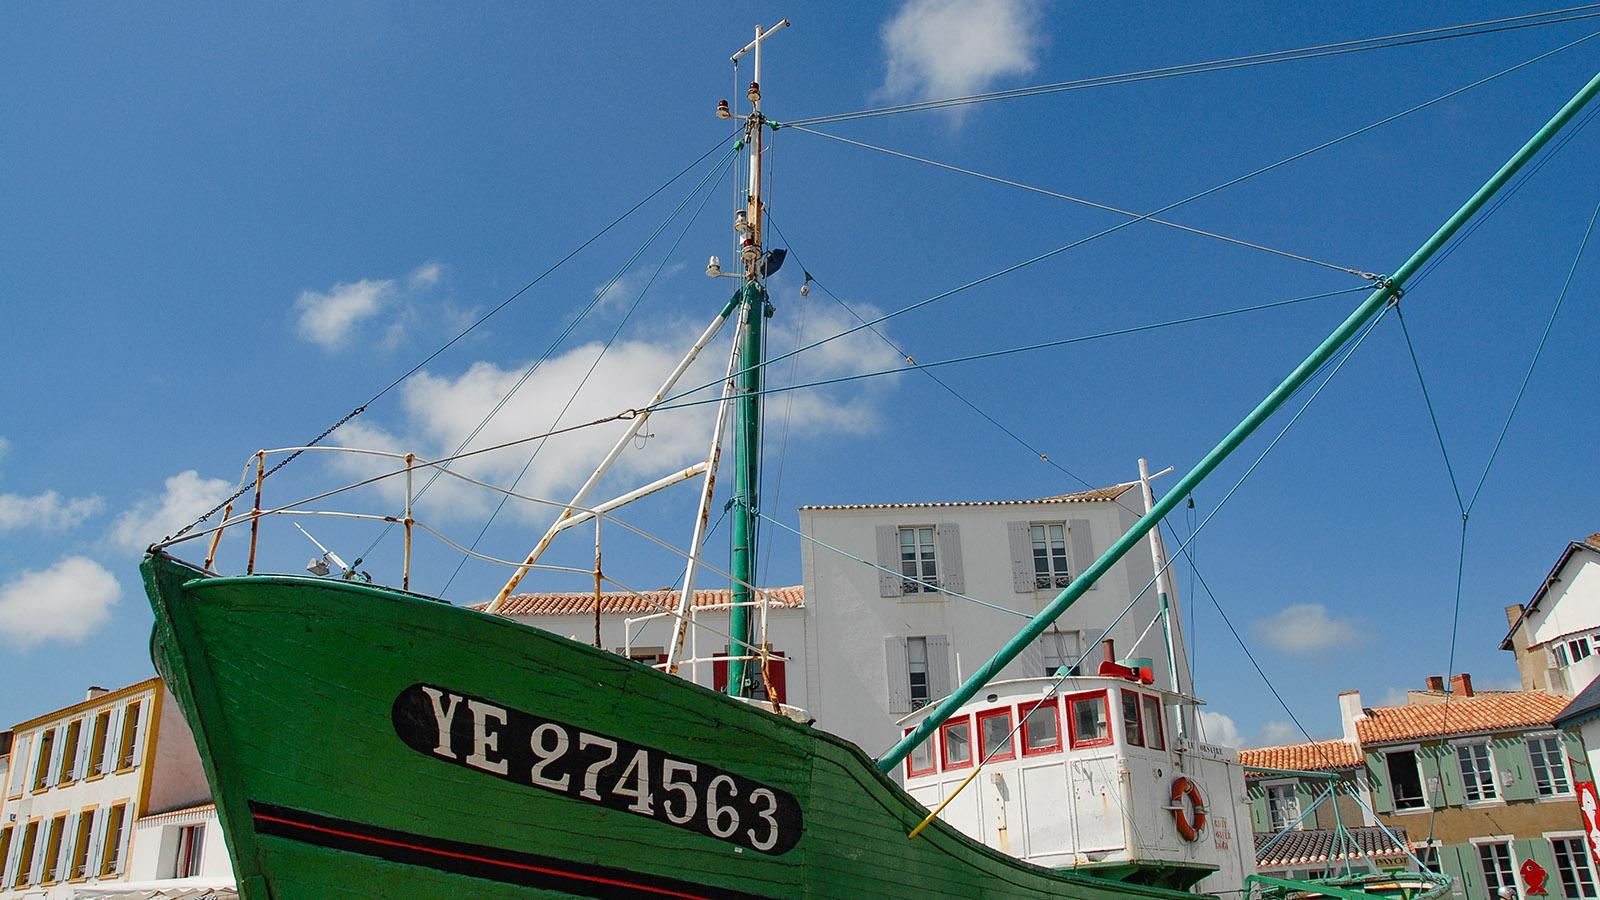 Île d'Yeu: Port-Joinville. Foto: Hilke Maunder